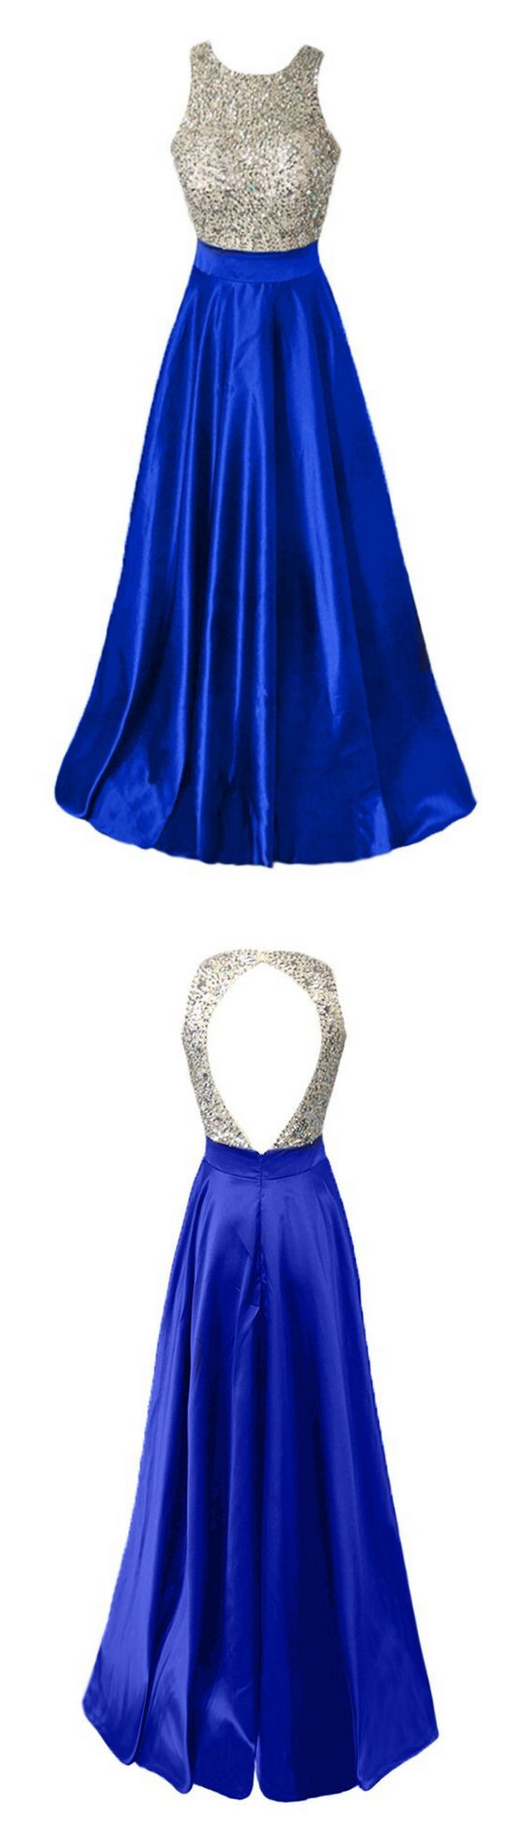 Royal blue stretch satin beaded top evening dresses hot cheap back